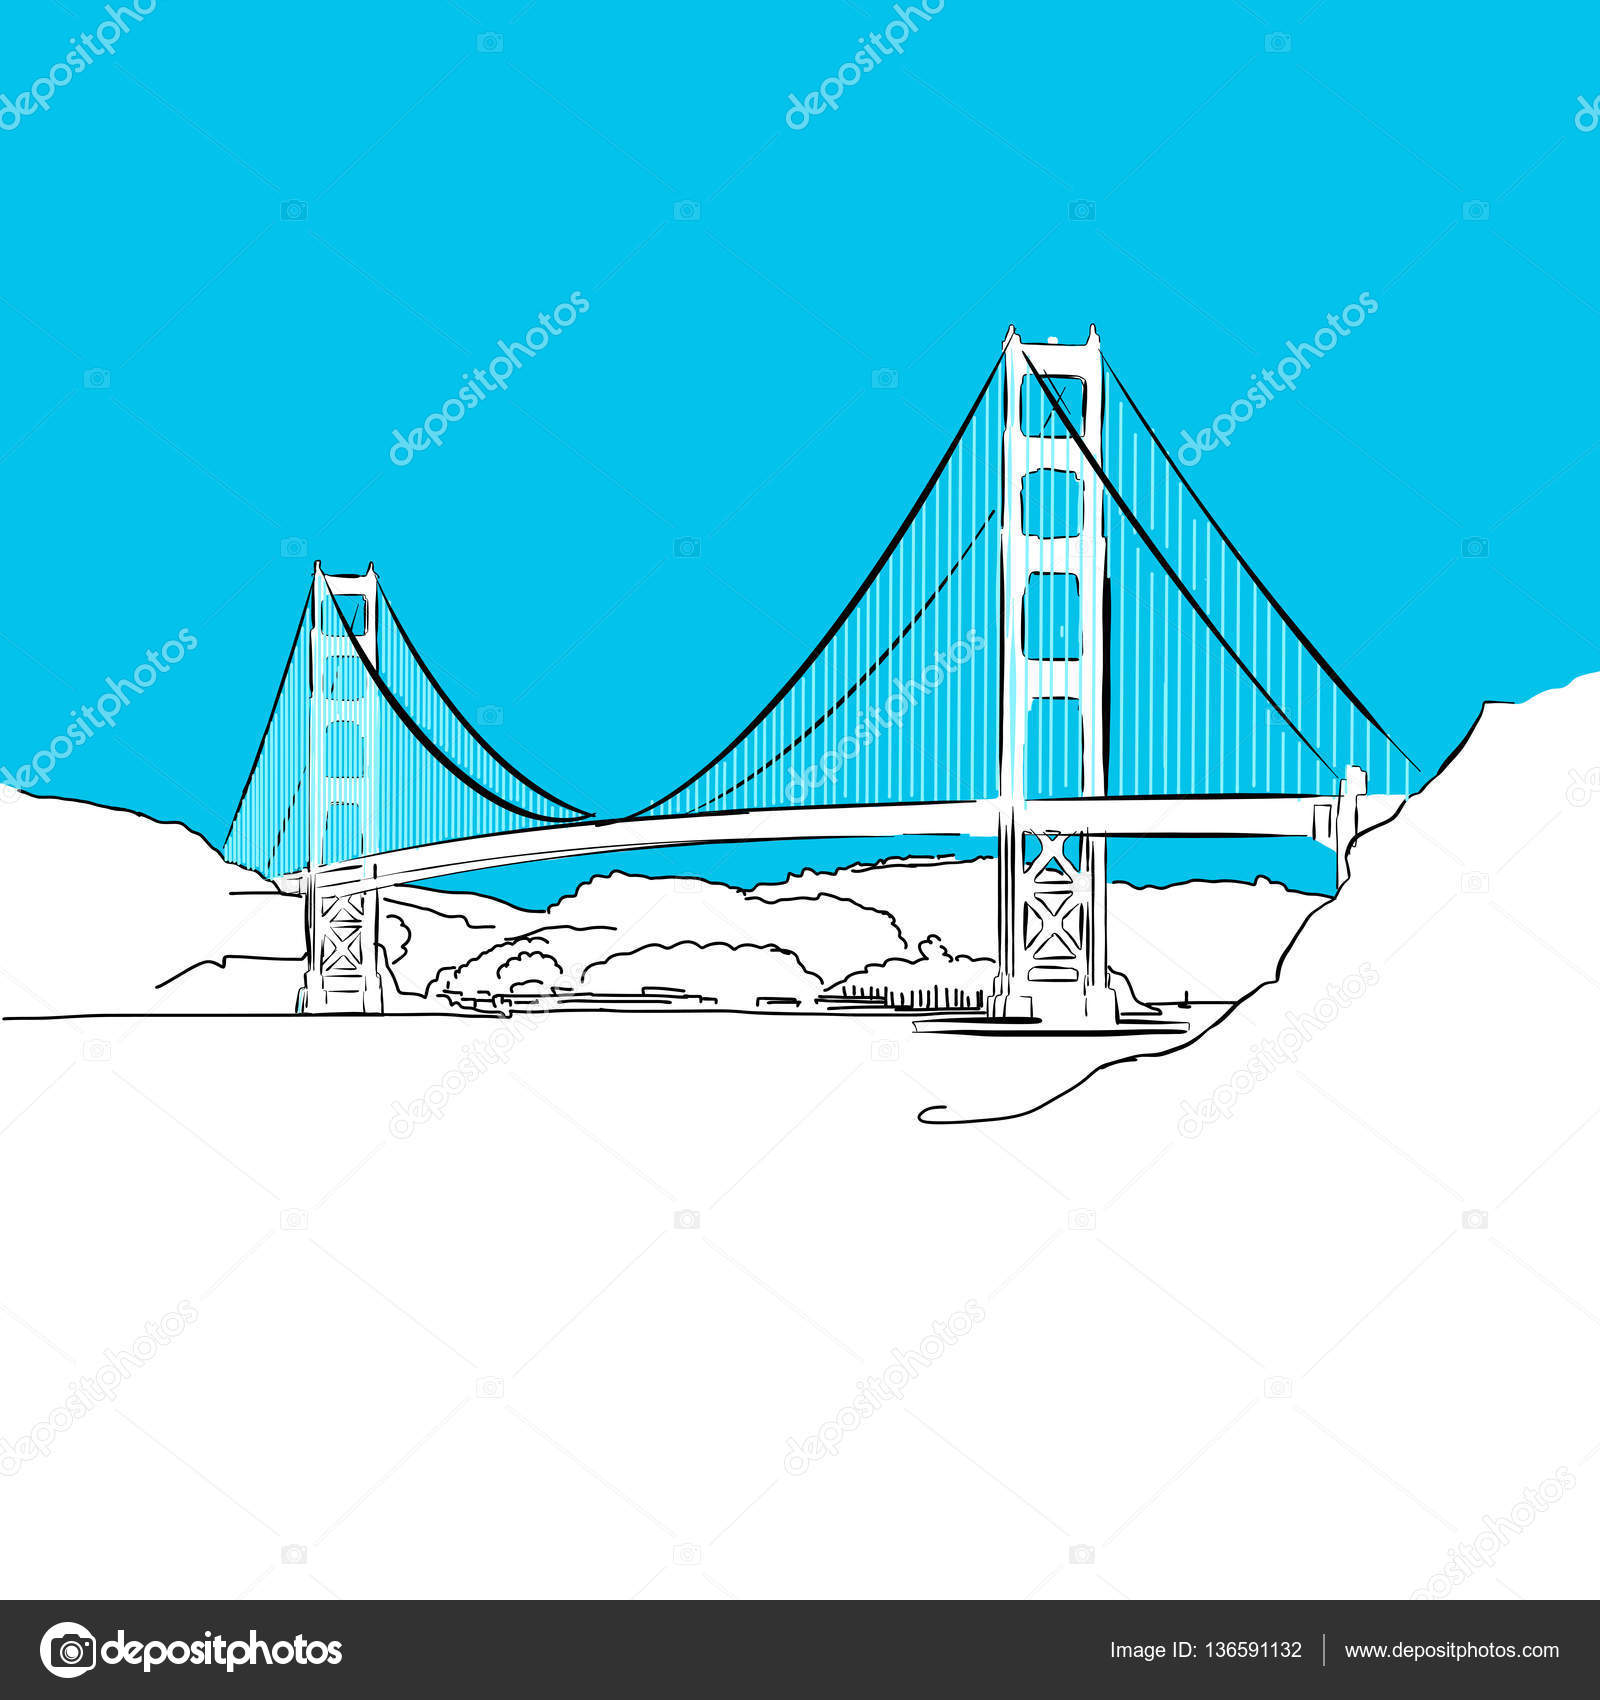 Golden Gate Bridge Vektor Blaue Reihe Stockvektor Mail Diagram Of The